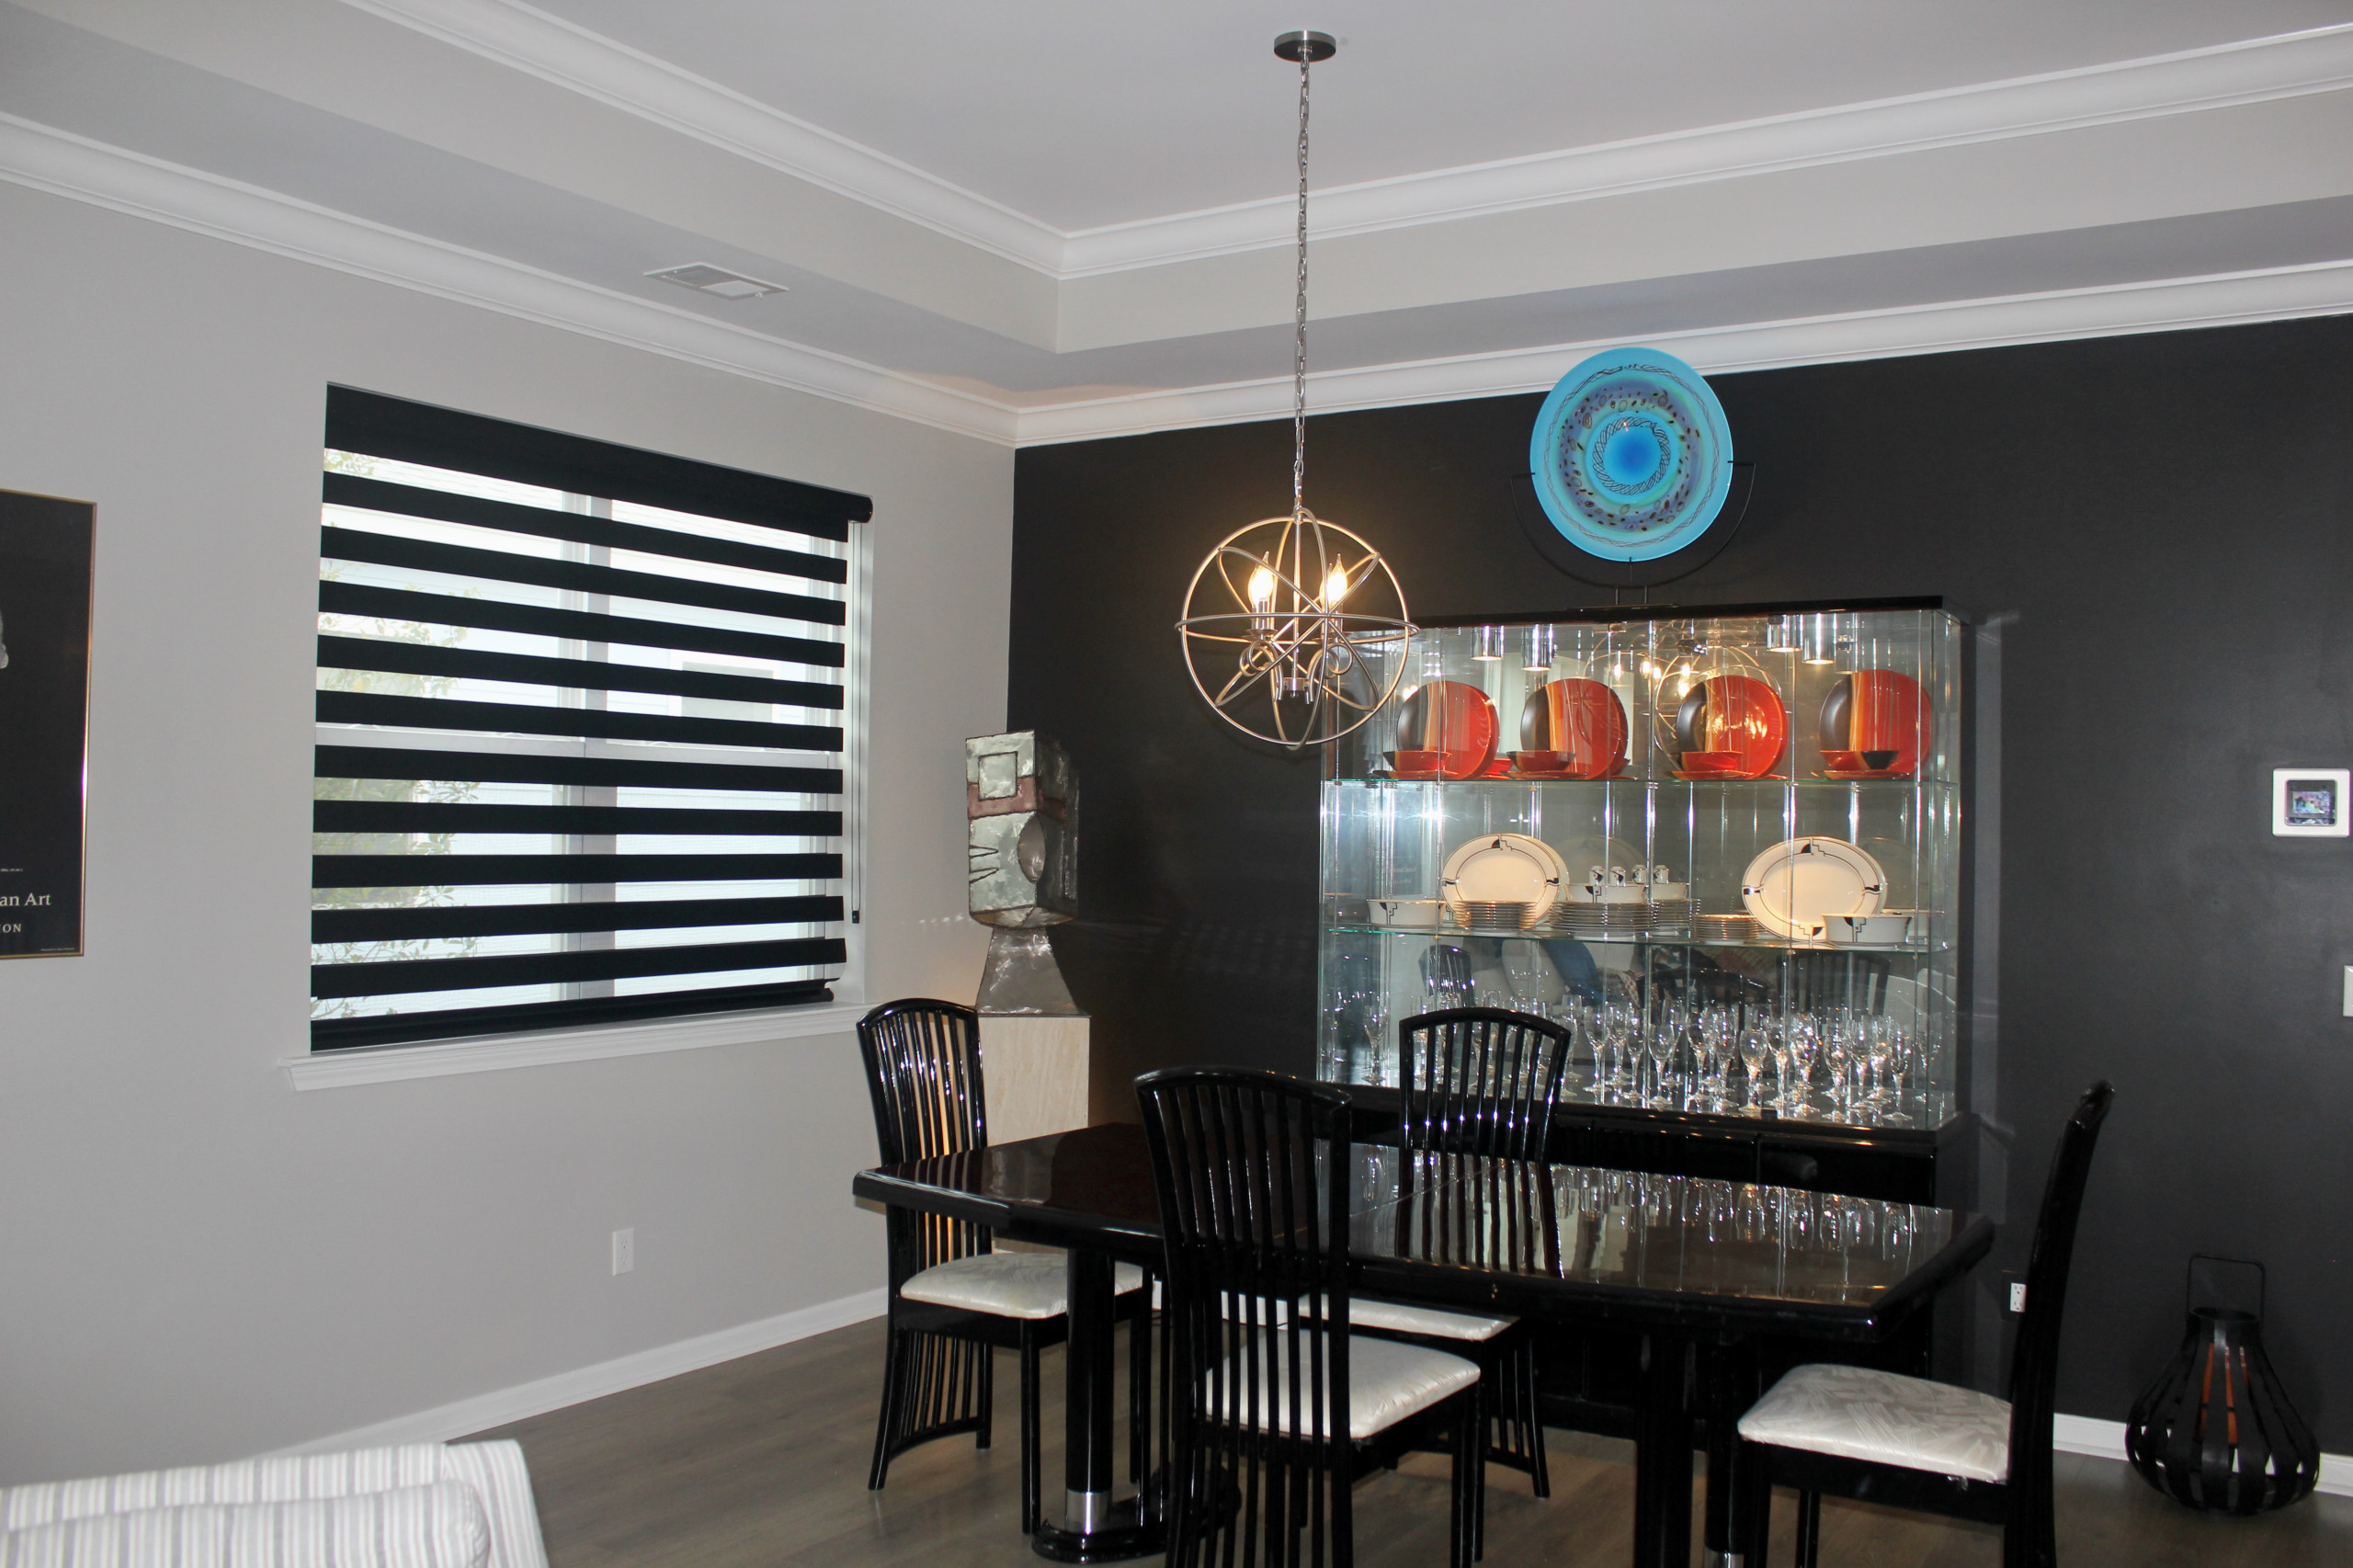 Margarittaville Design Dining Area